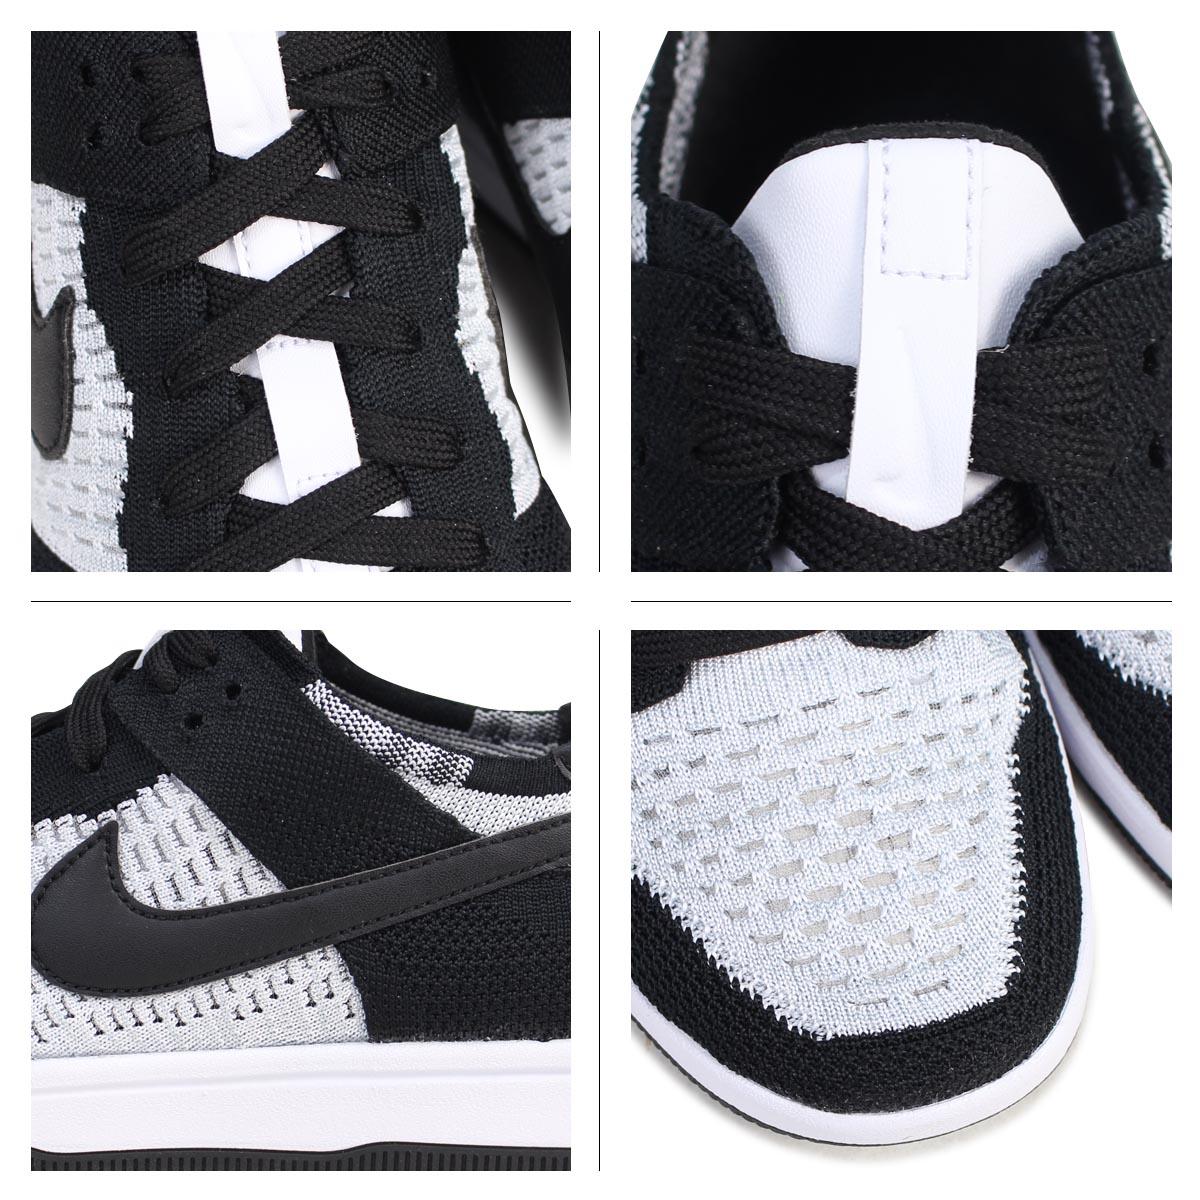 ef091ce80d0 Sugar Online Shop  Nike NIKE dunk loaf rye knit sneakers DUNK LOW ...